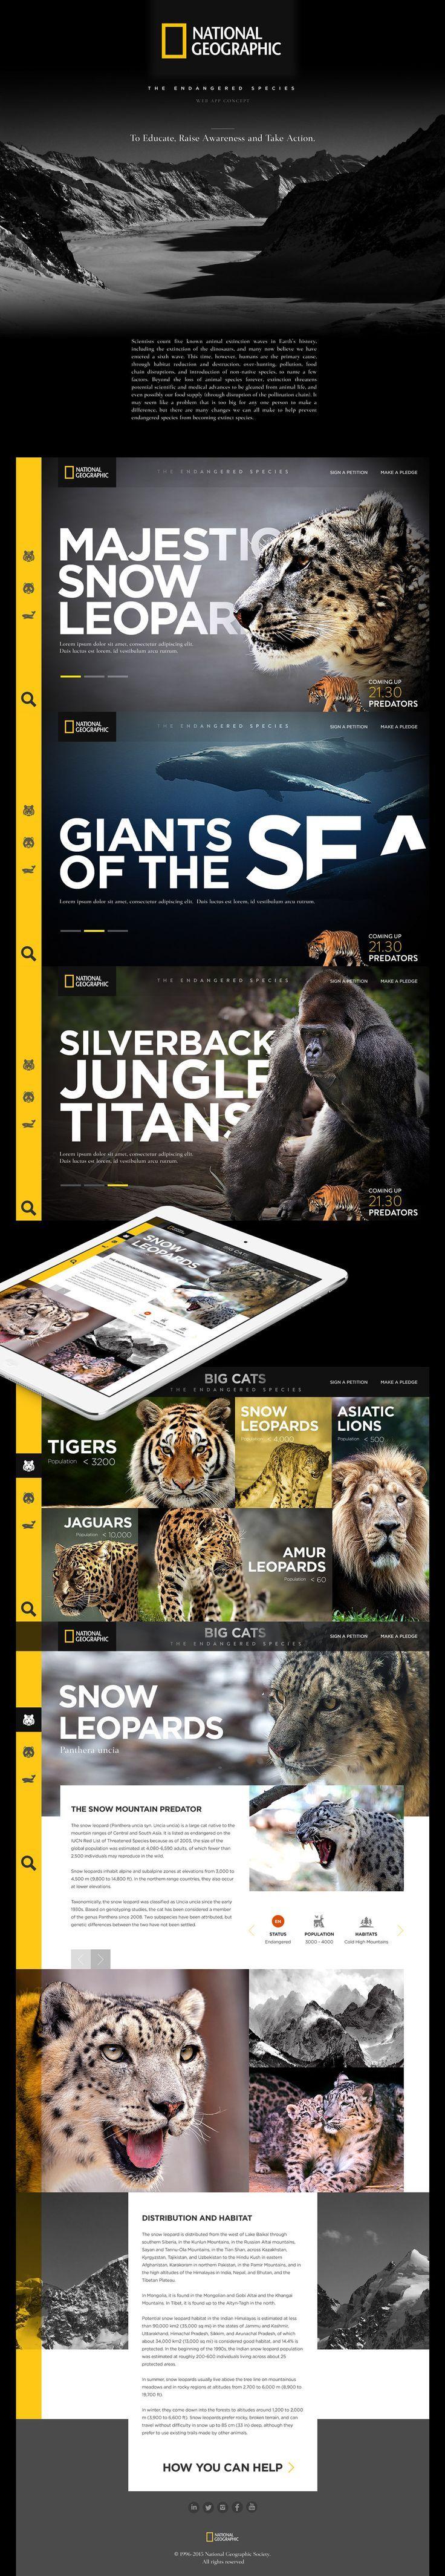 Inspiration   Five Star Branding Agency   Fivestar Design and Website Branding   Page 2